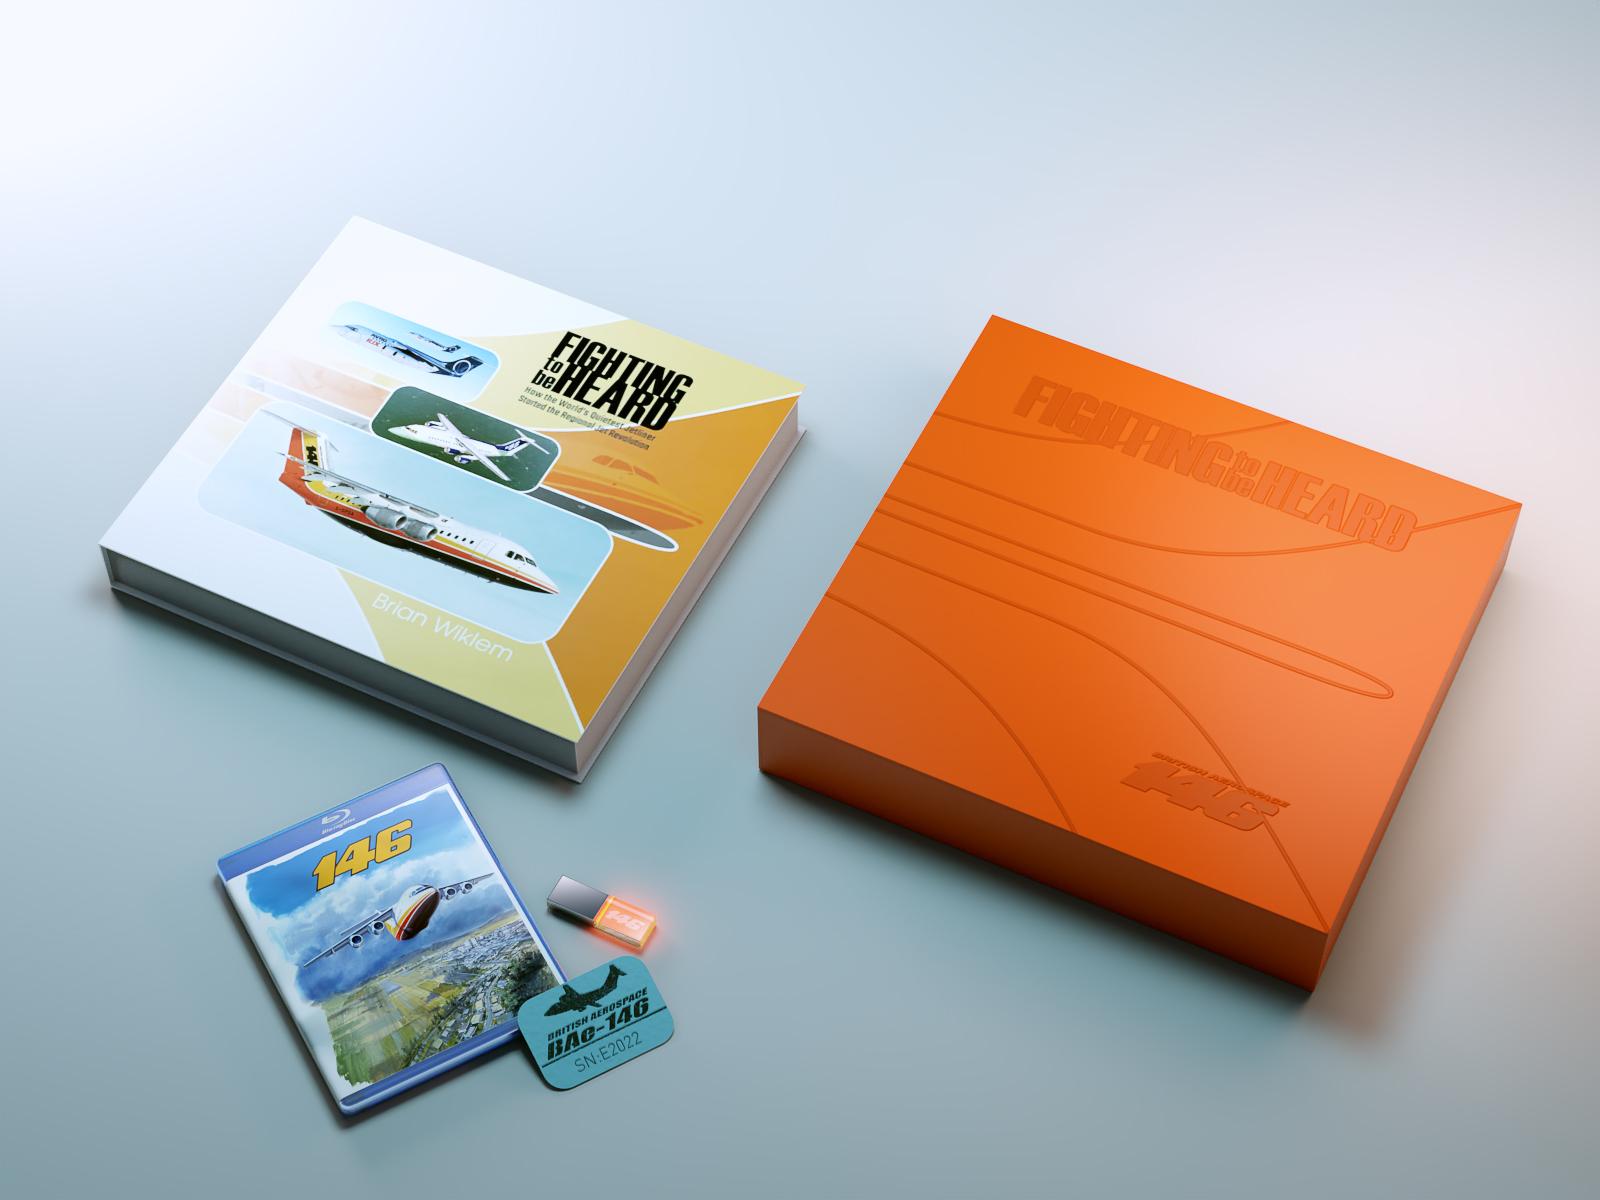 Book_USB_DVD